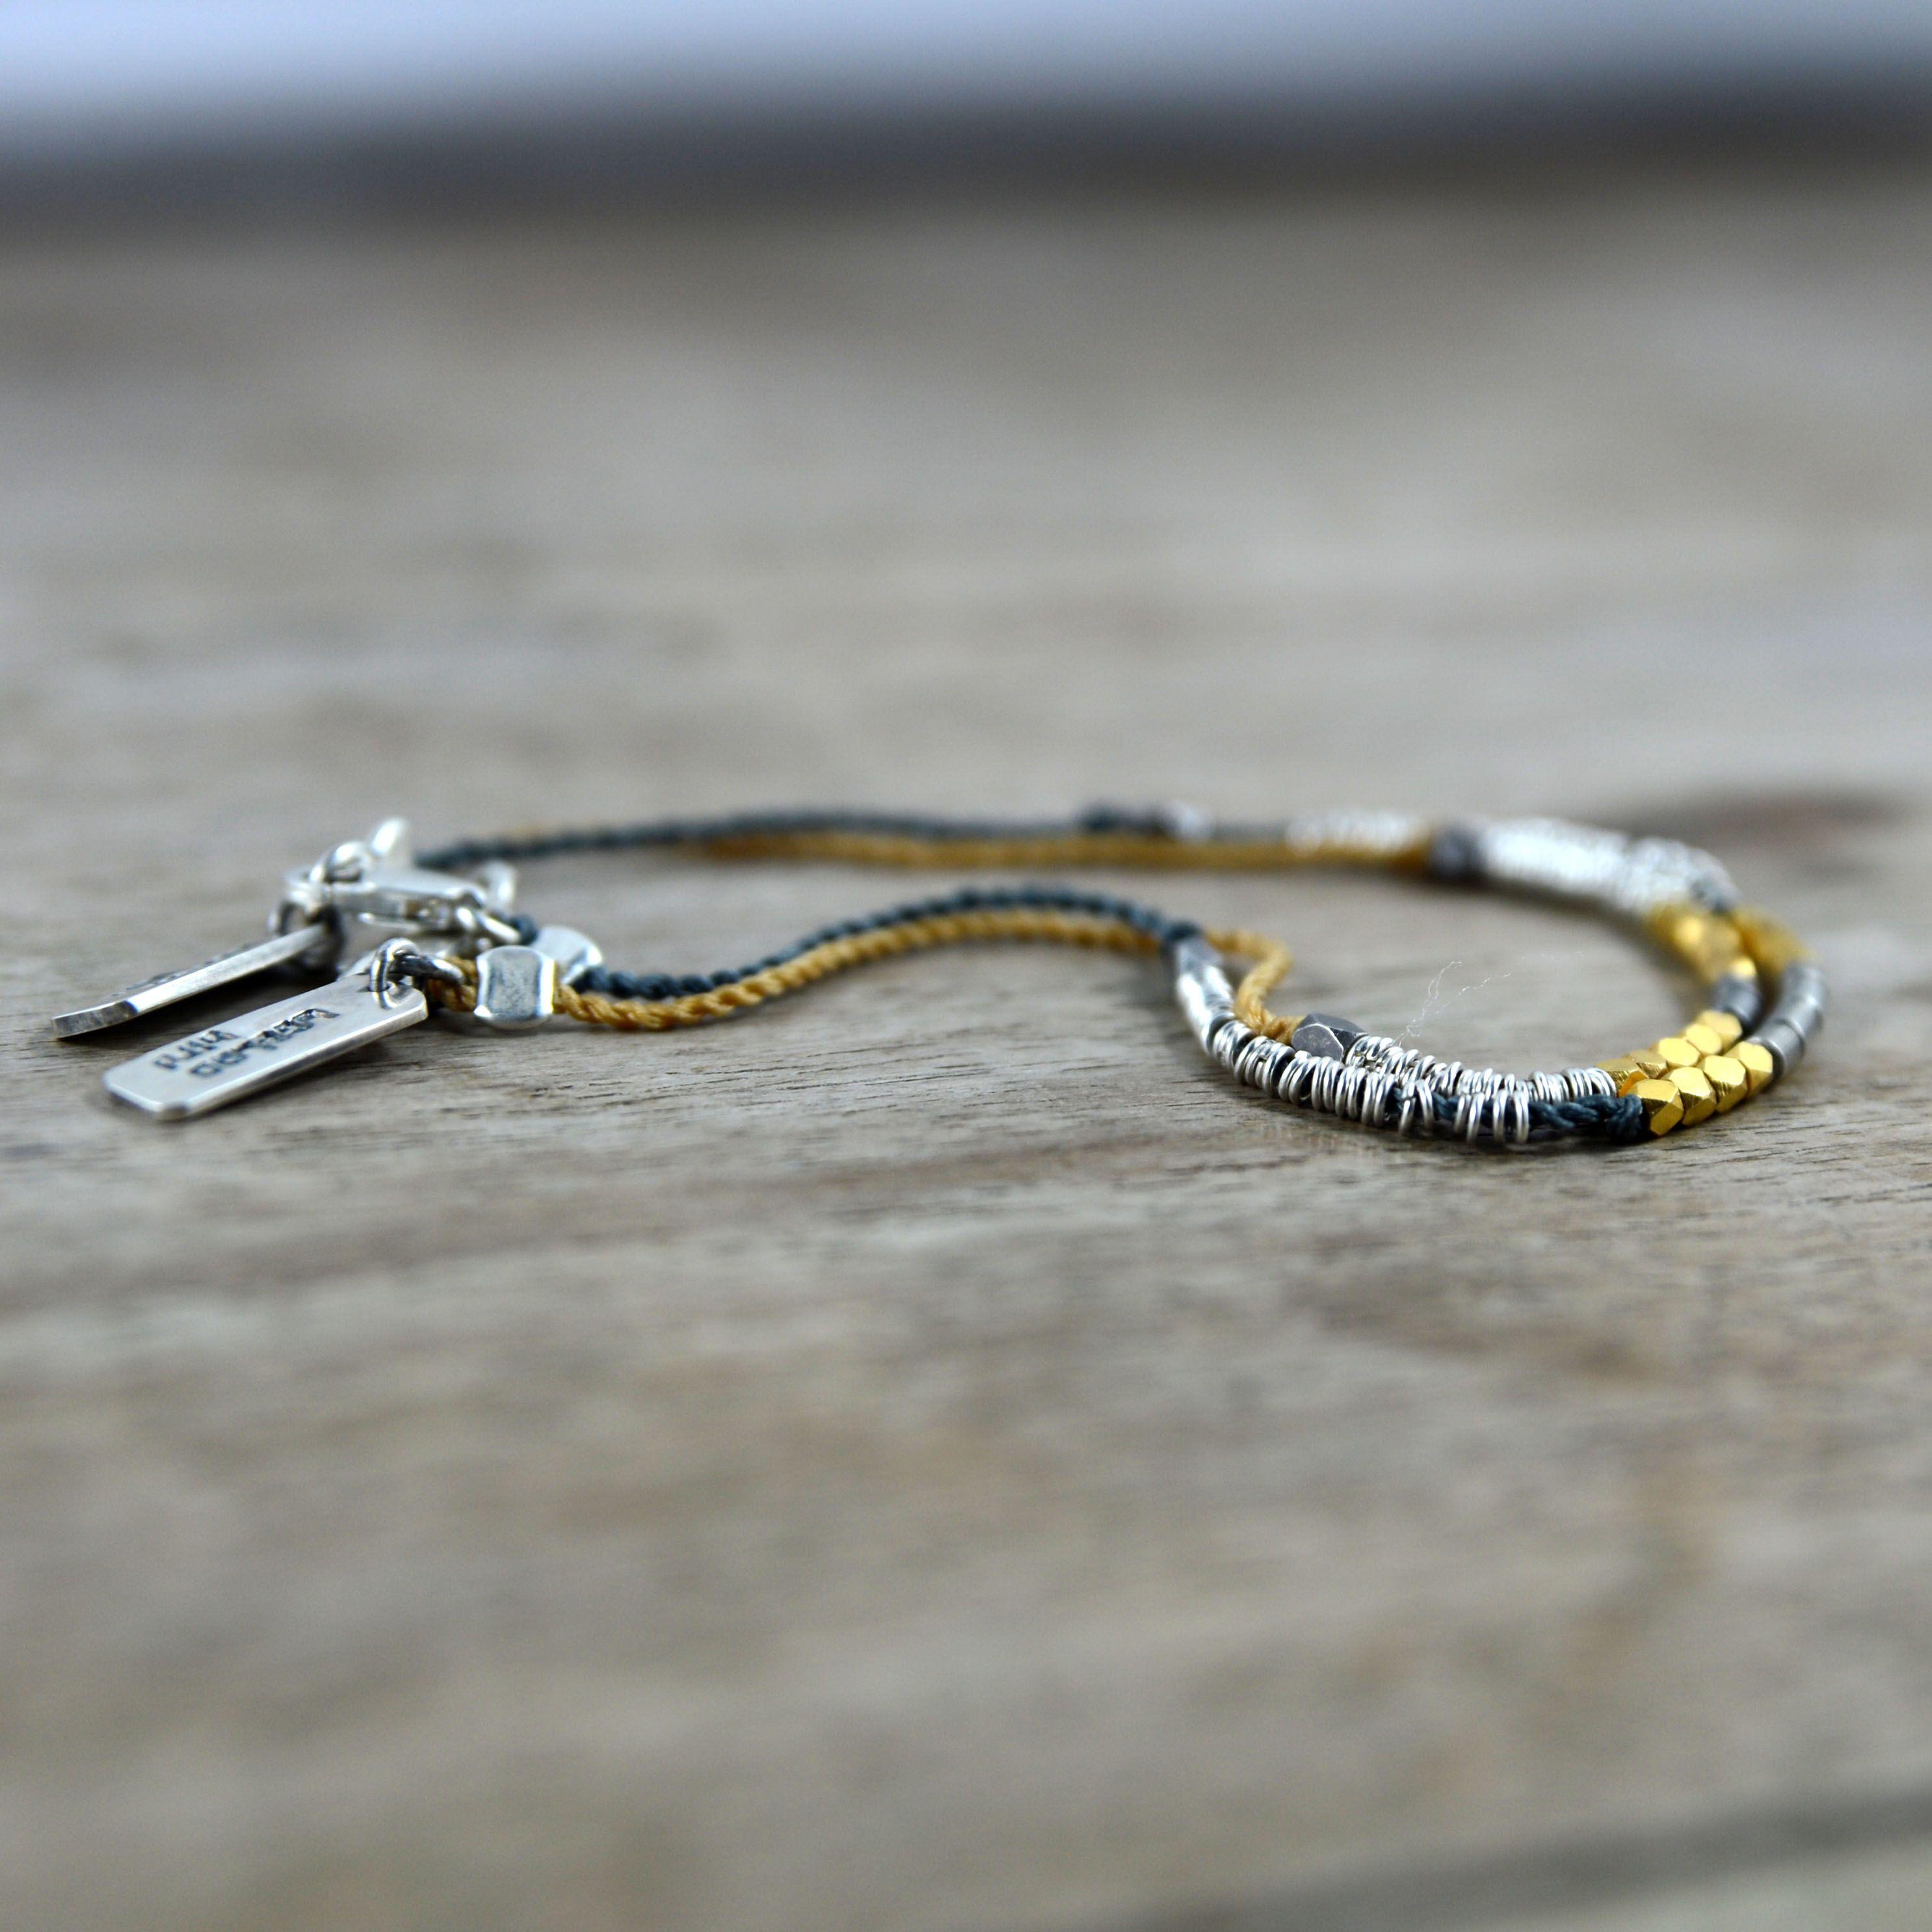 Silicone Bracelet Fundraiser